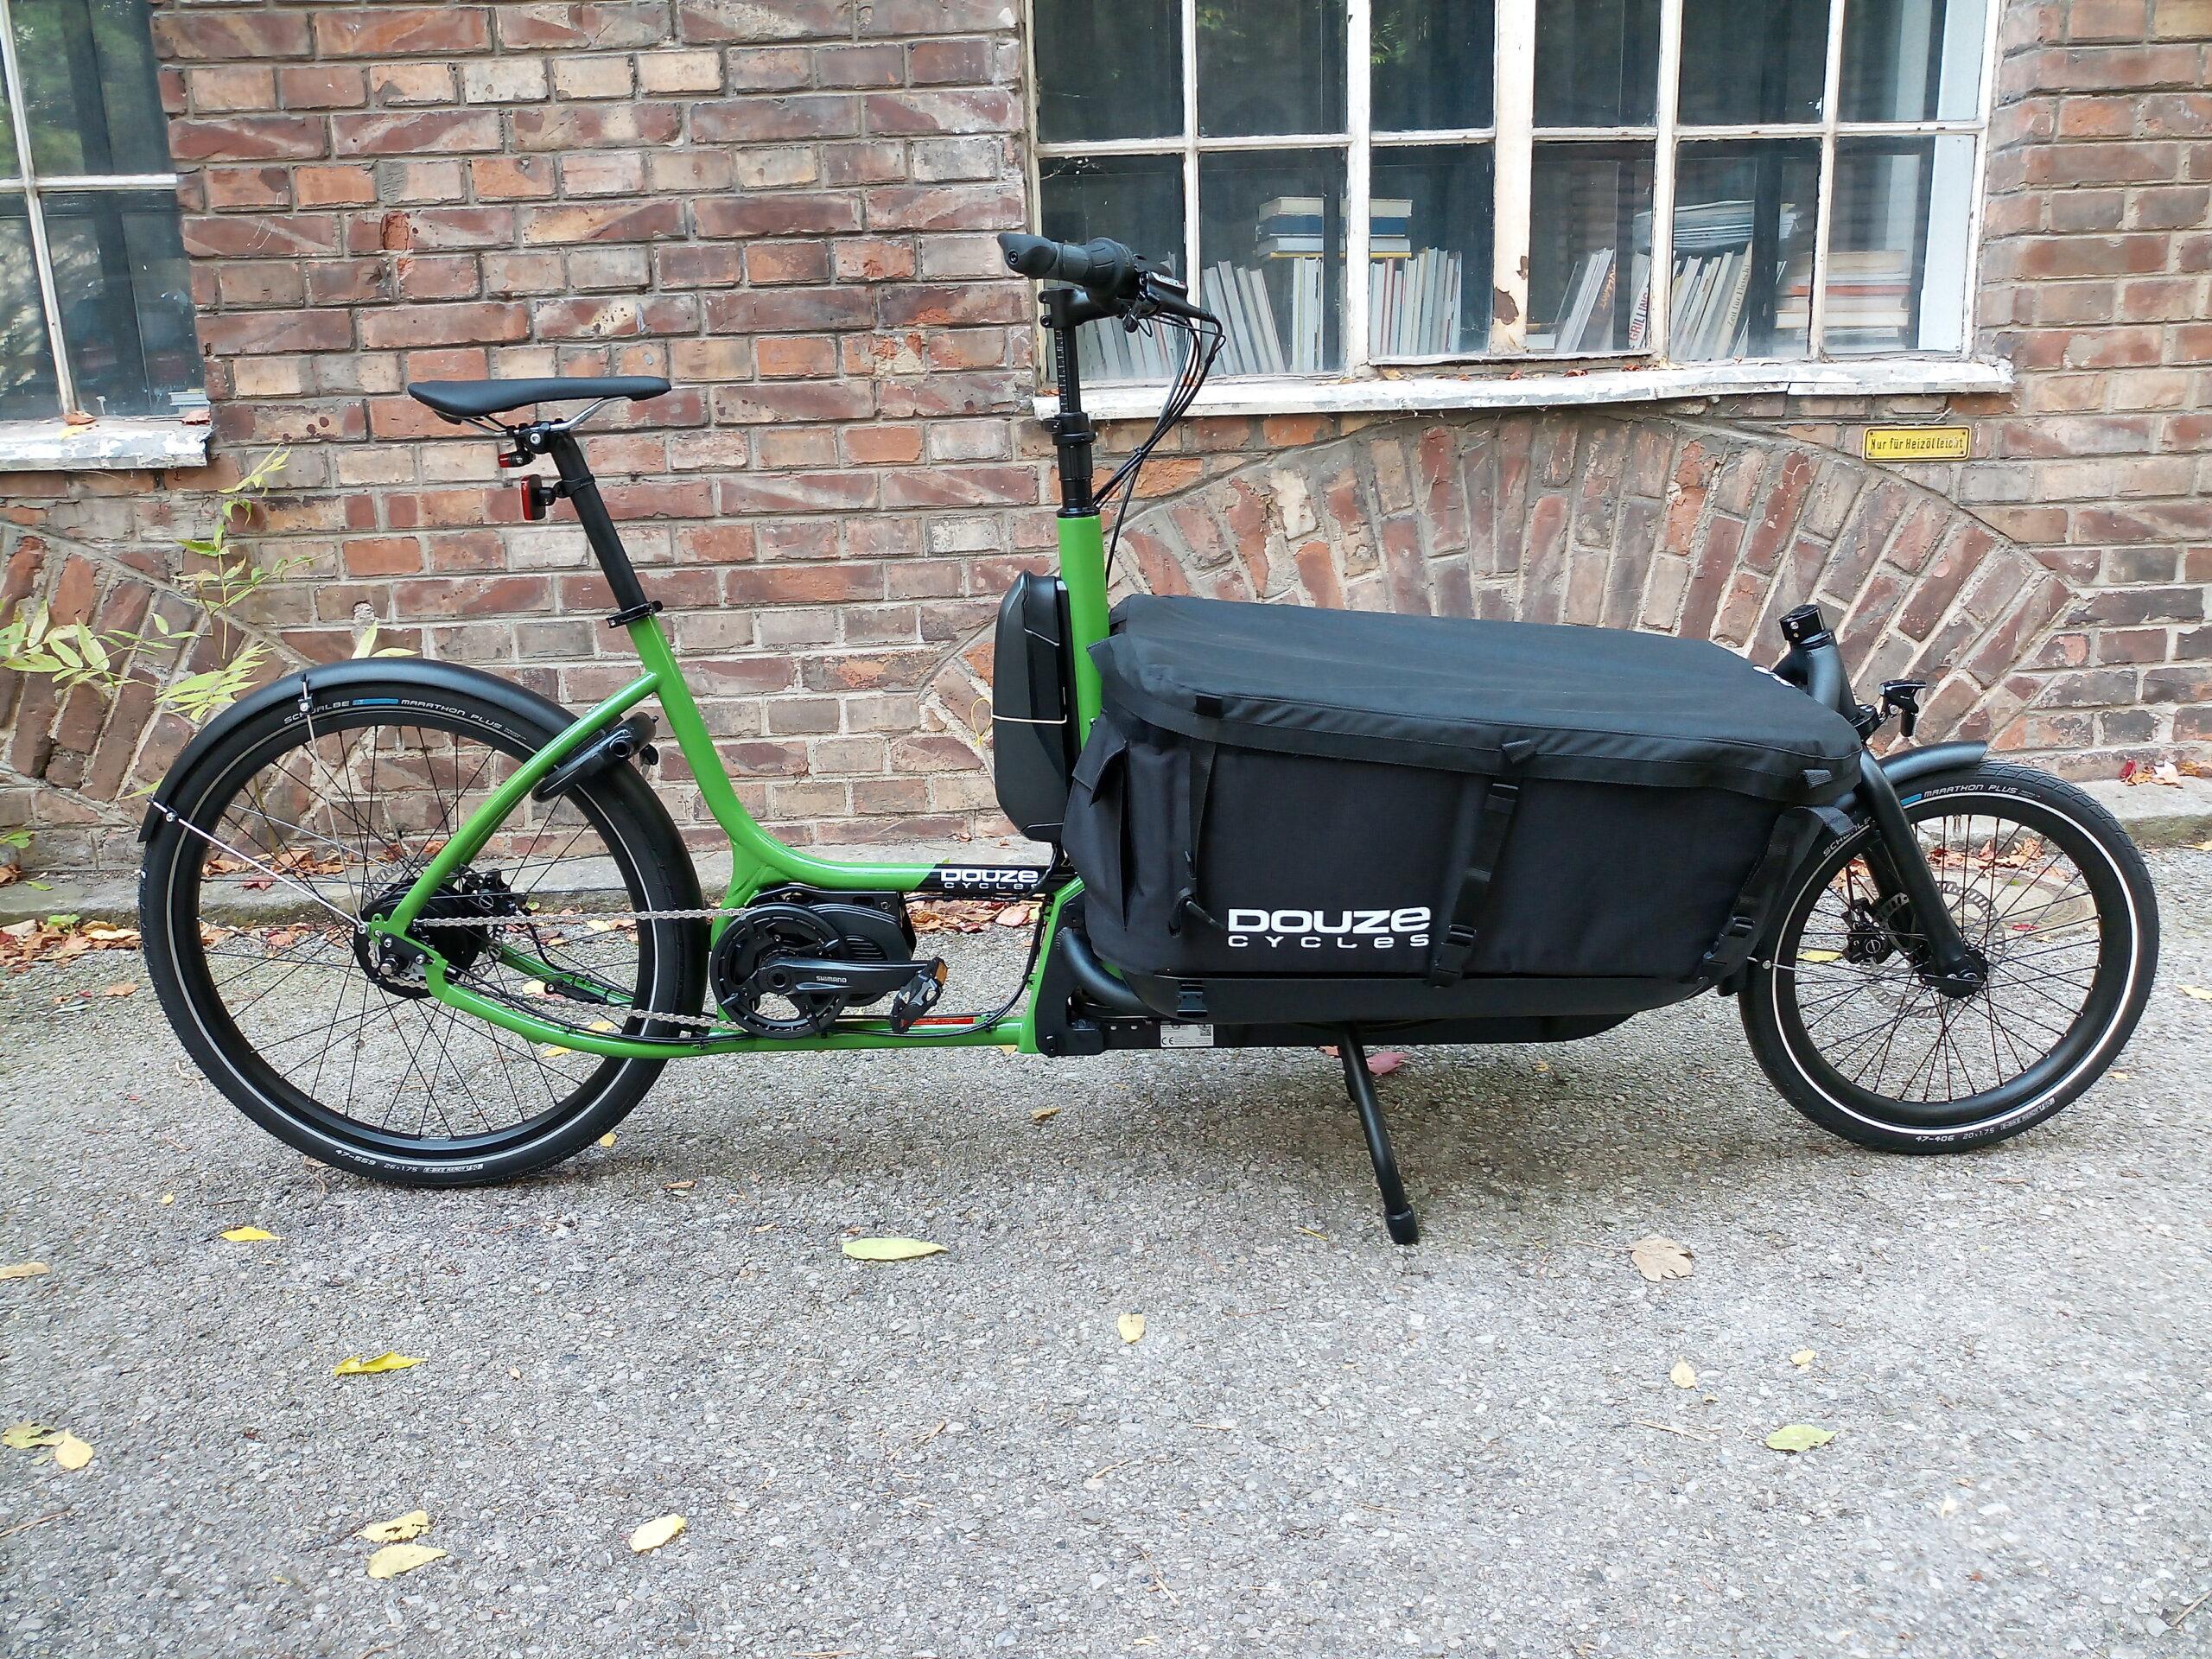 Douze Cycles V2 Traveller Lastenrad kaufen bei Heavy Pedals in Wien